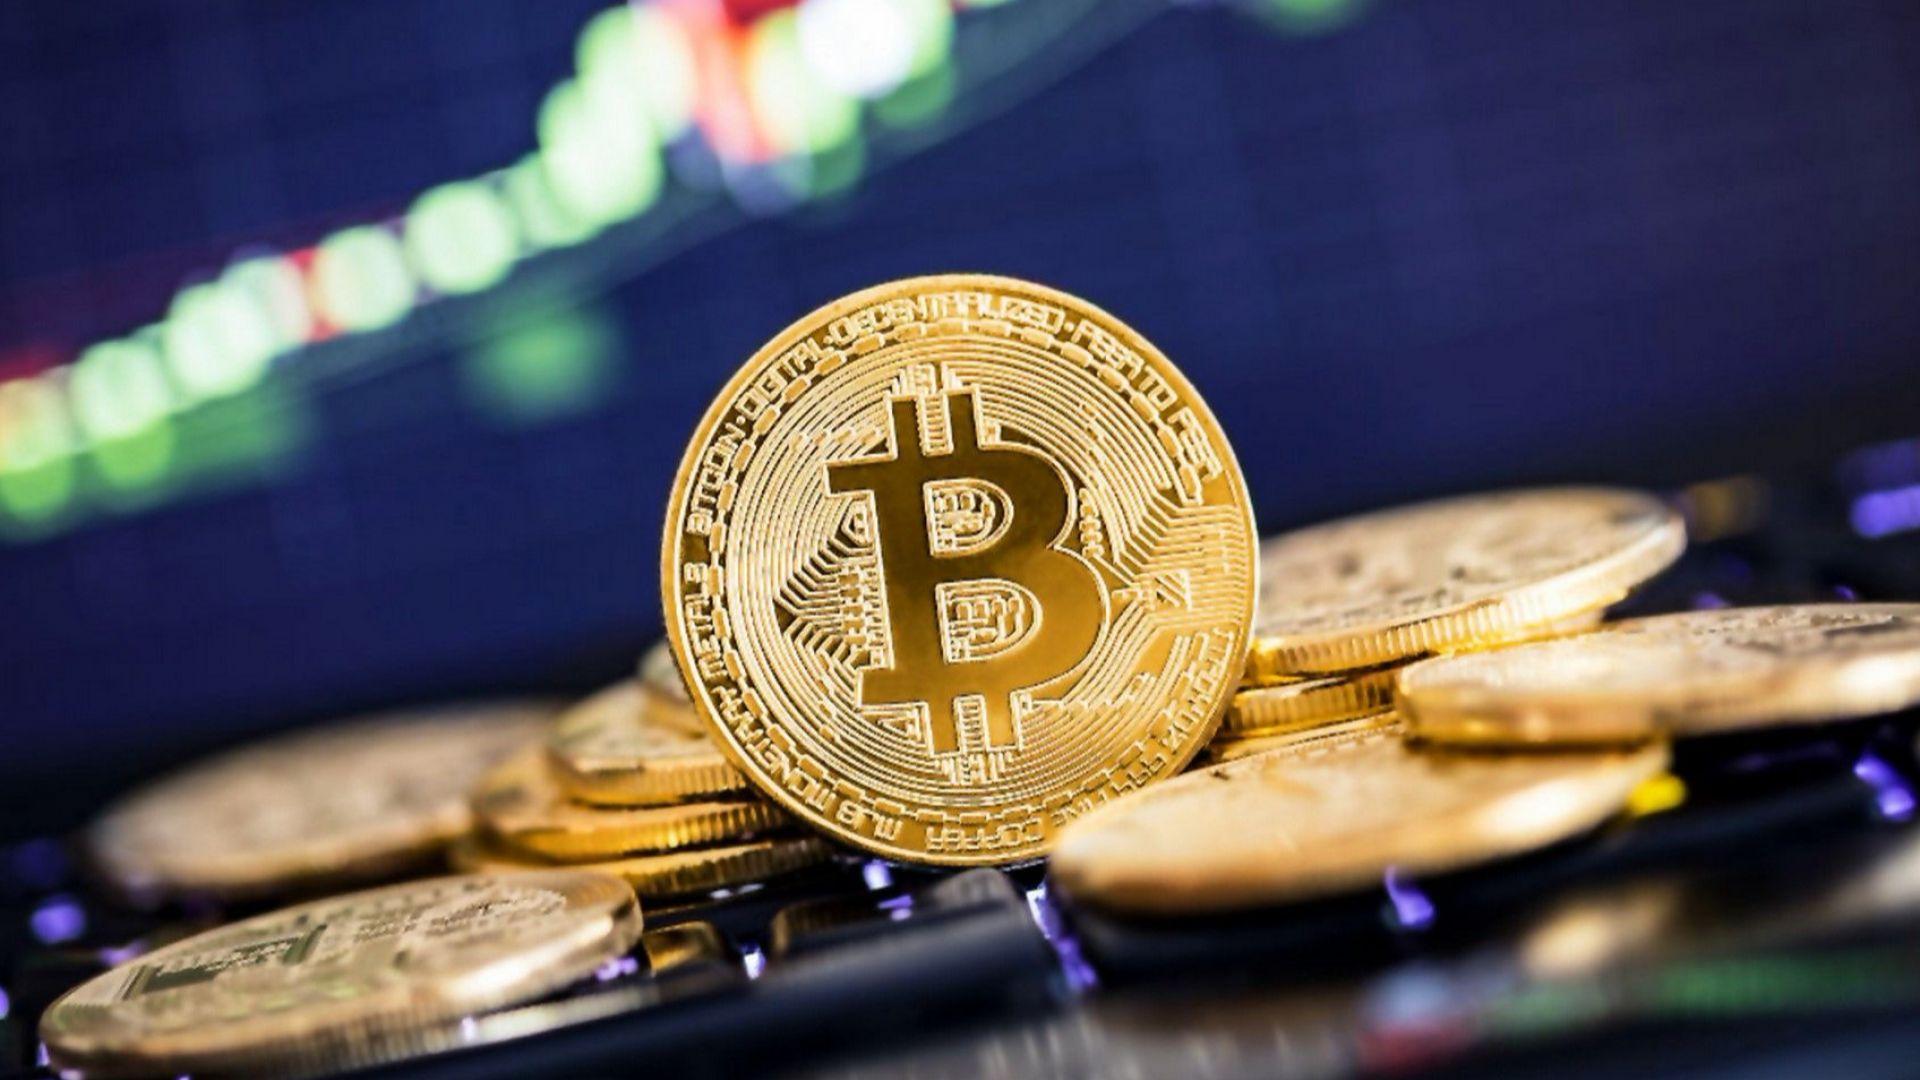 Проучете пазара преди да инвестирате